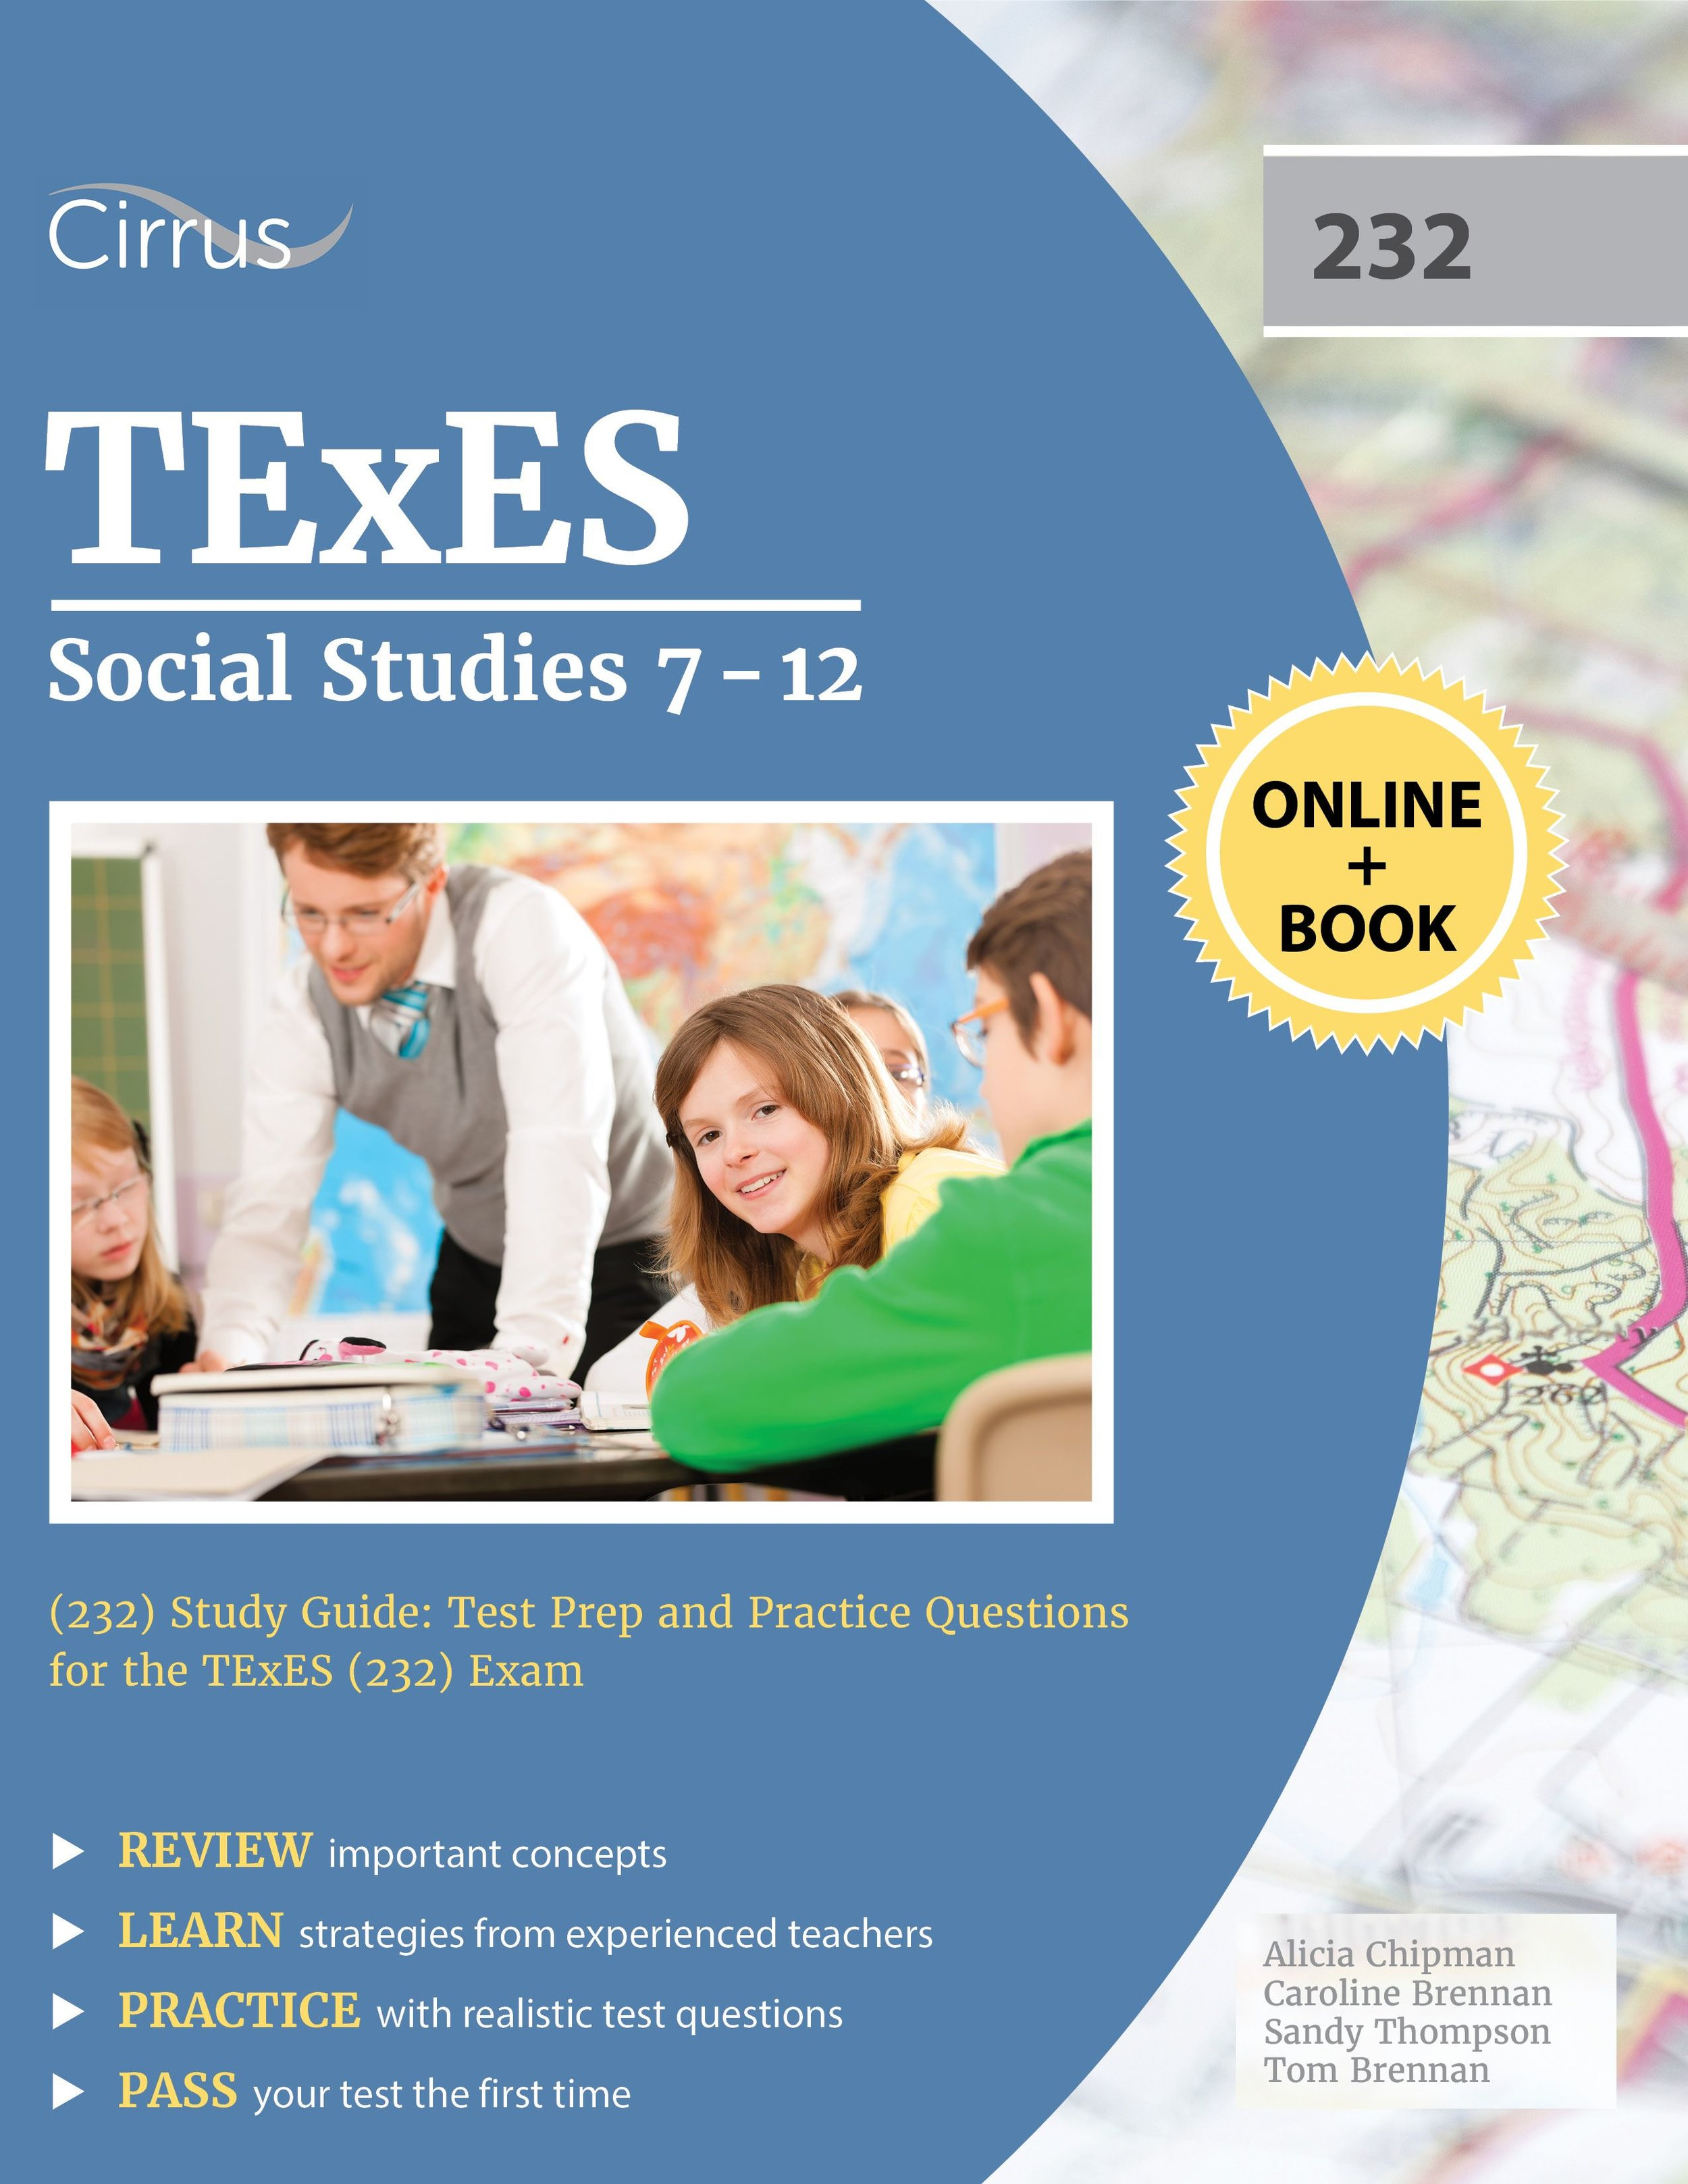 TExES_social_studies_website-compressor.jpg